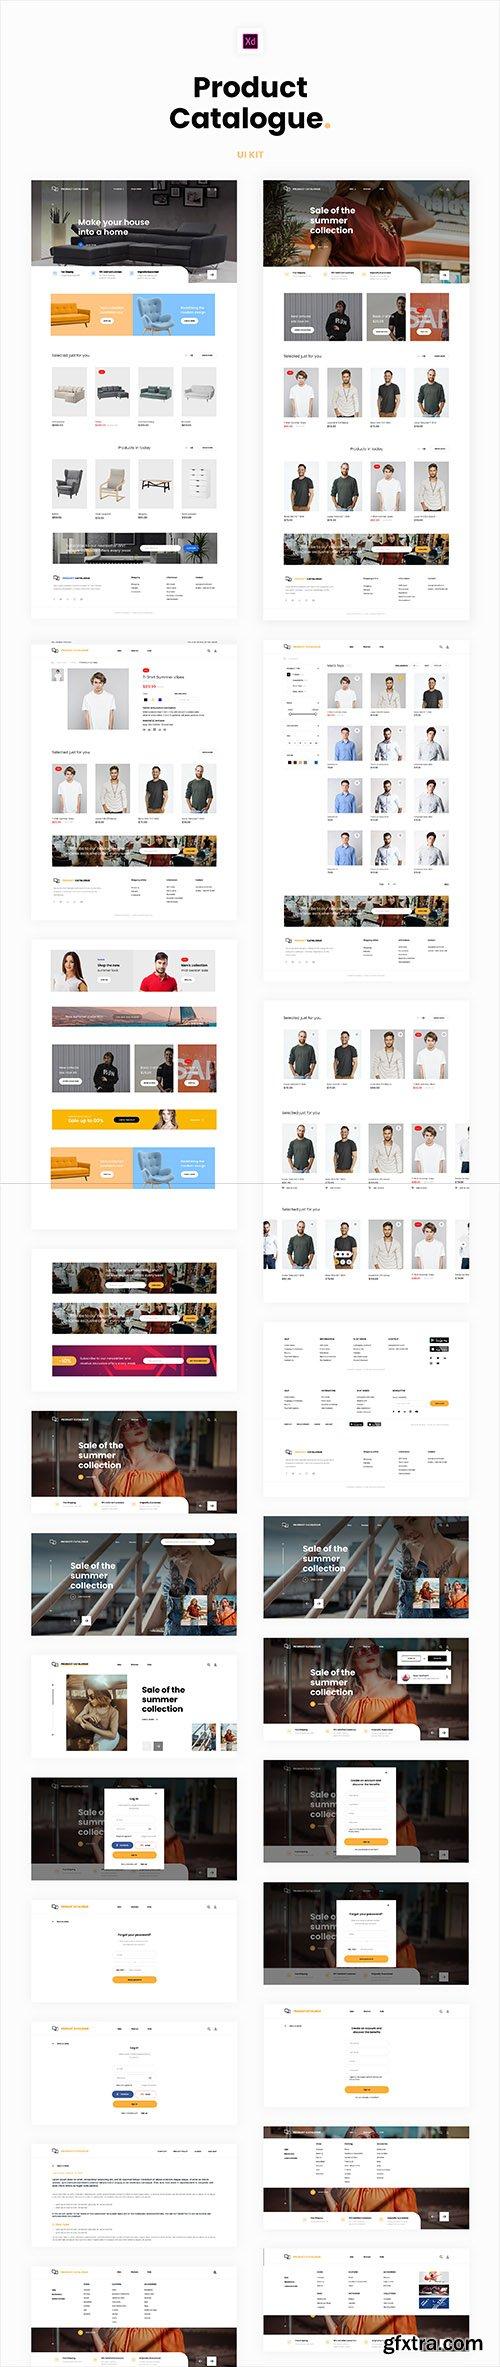 Product Catalogue UI Kit